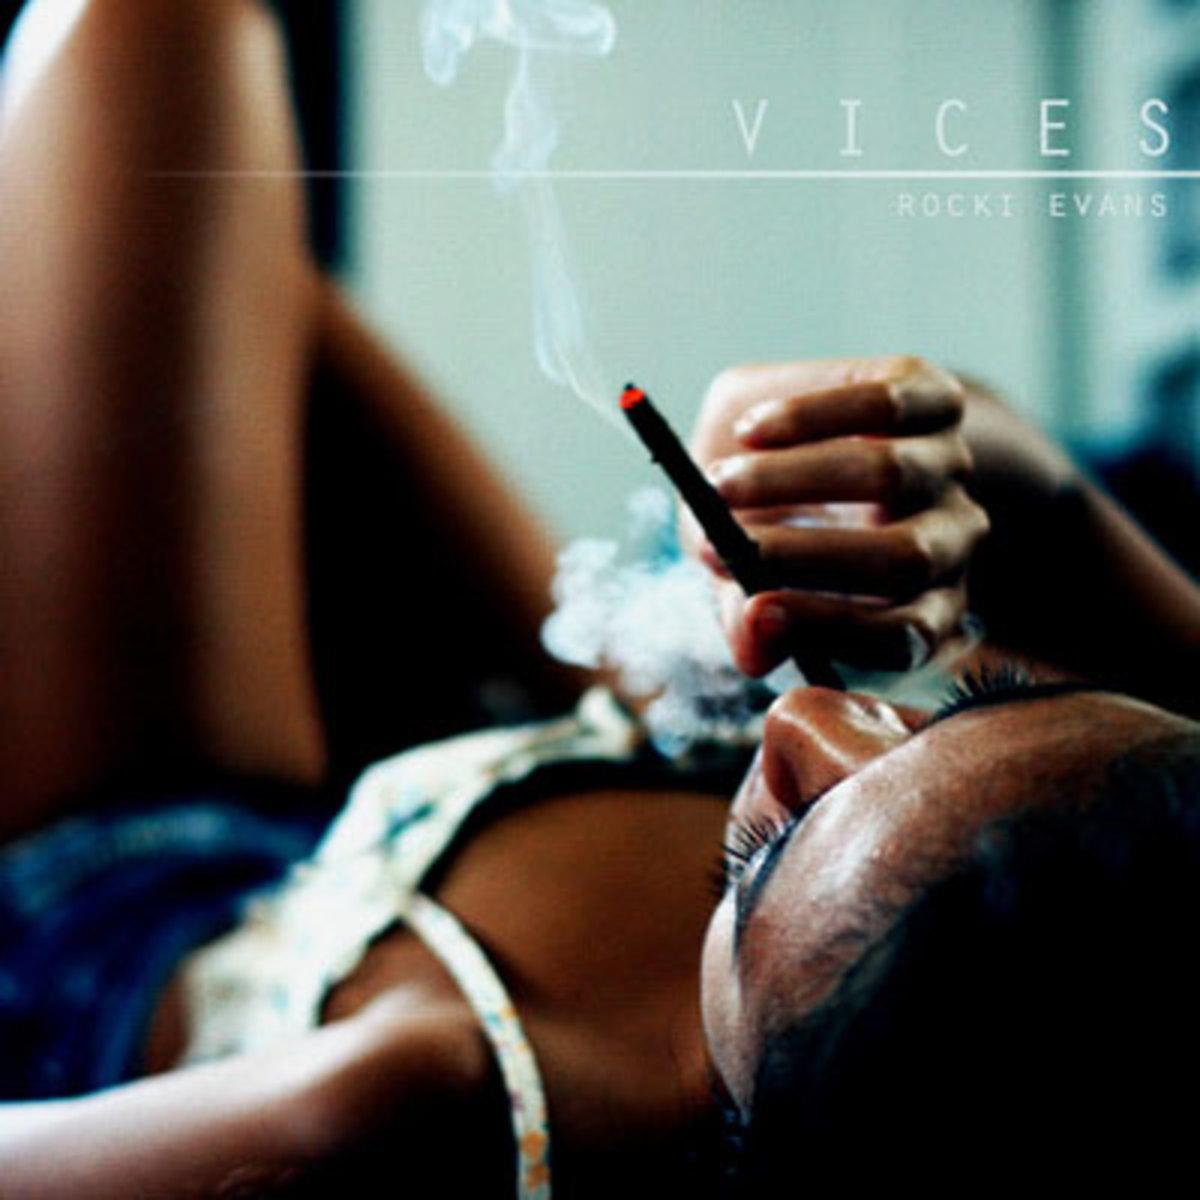 rockievans-vices.jpg